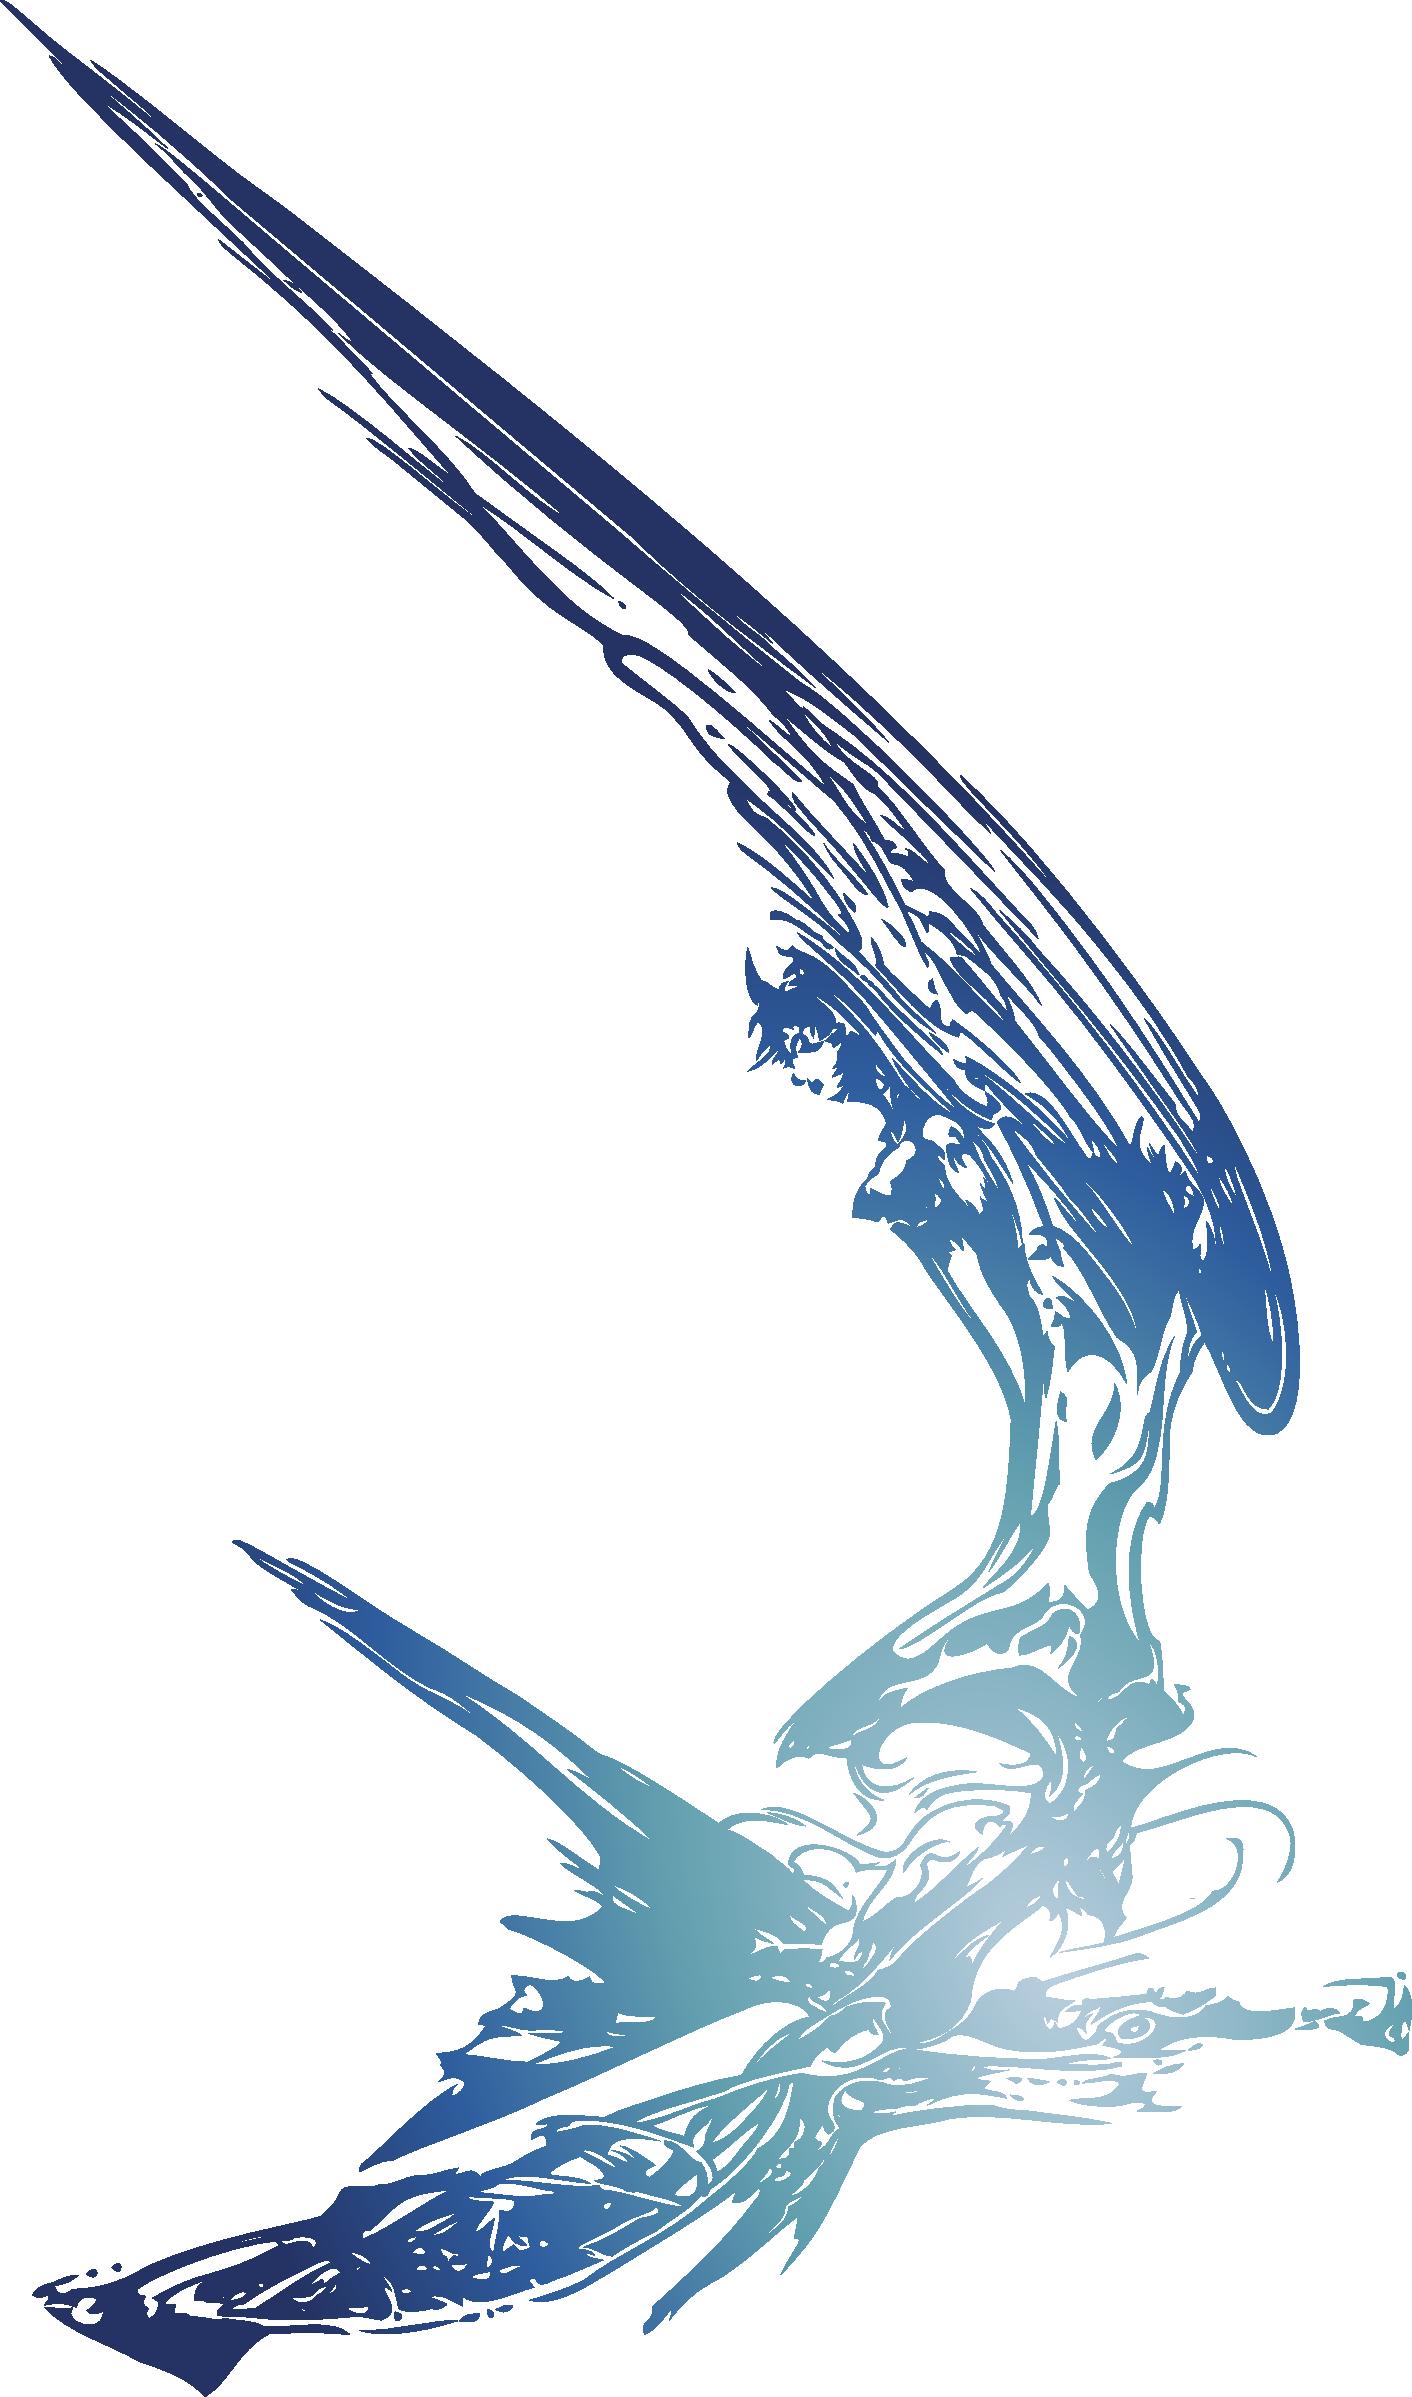 Final fantasy xii logo png - photo#3